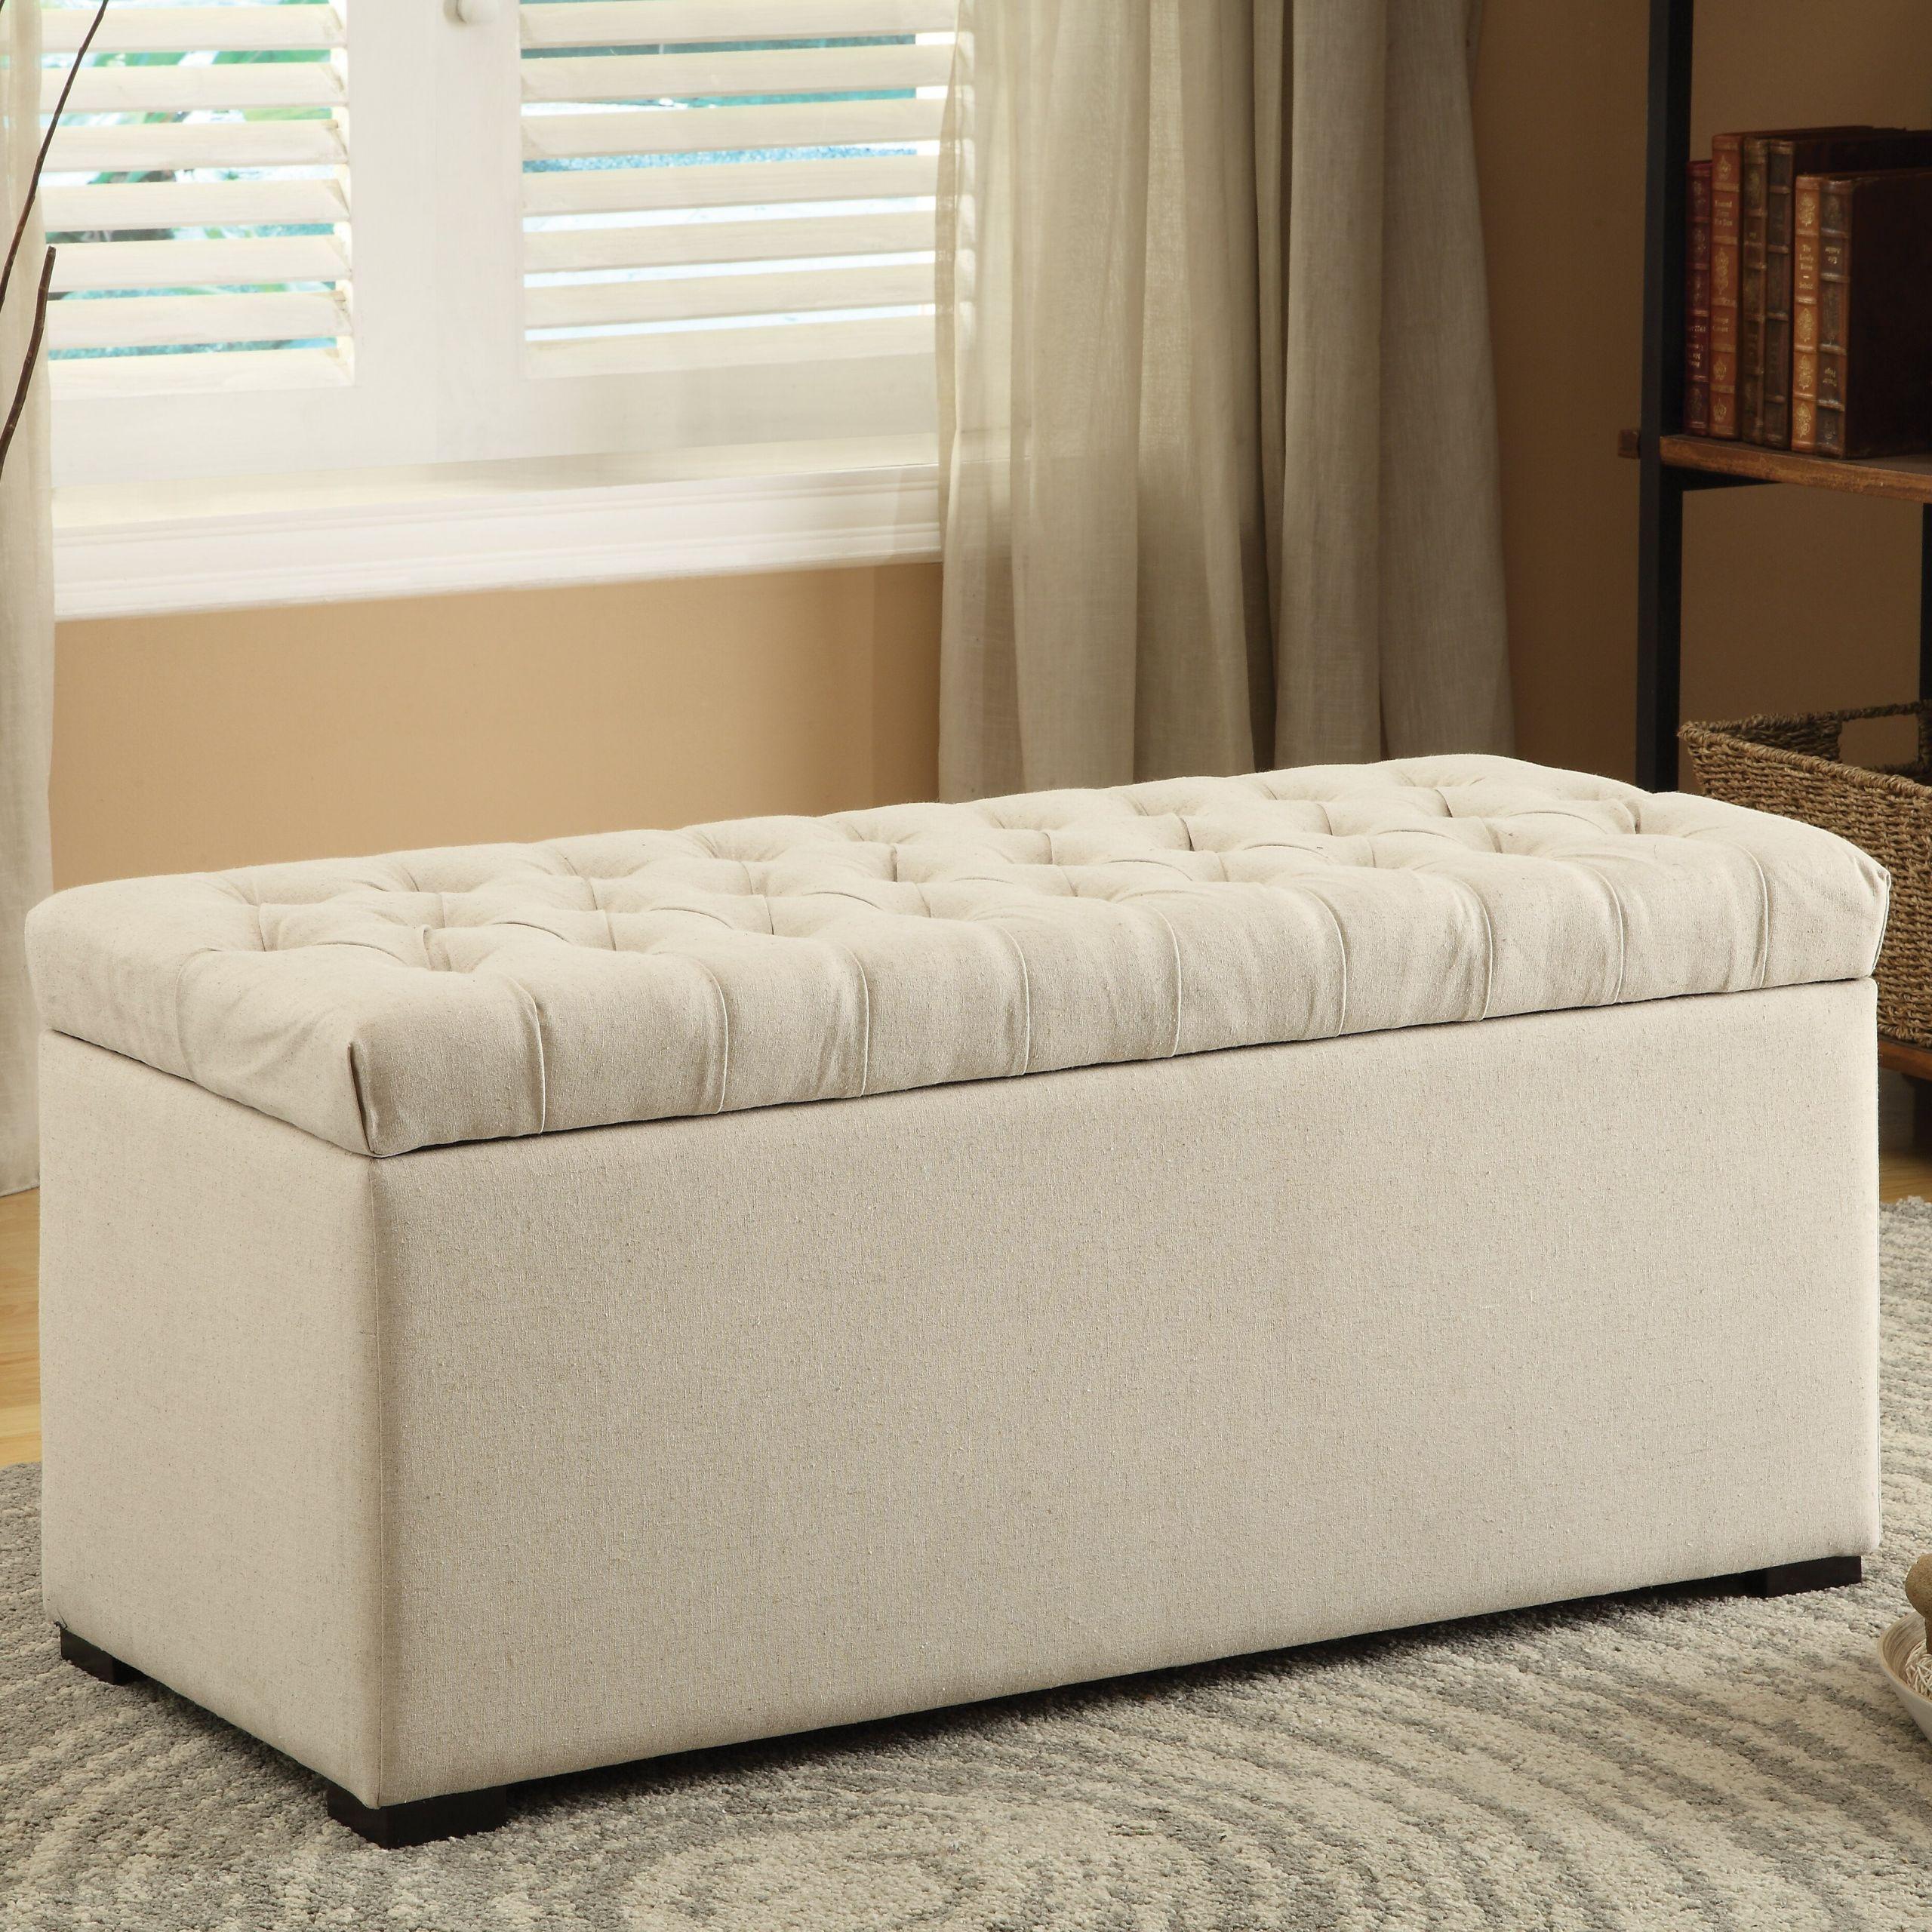 Storage Bench Bedroom  Charlton Home Taunton e Seat Wood Storage Bedroom Bench